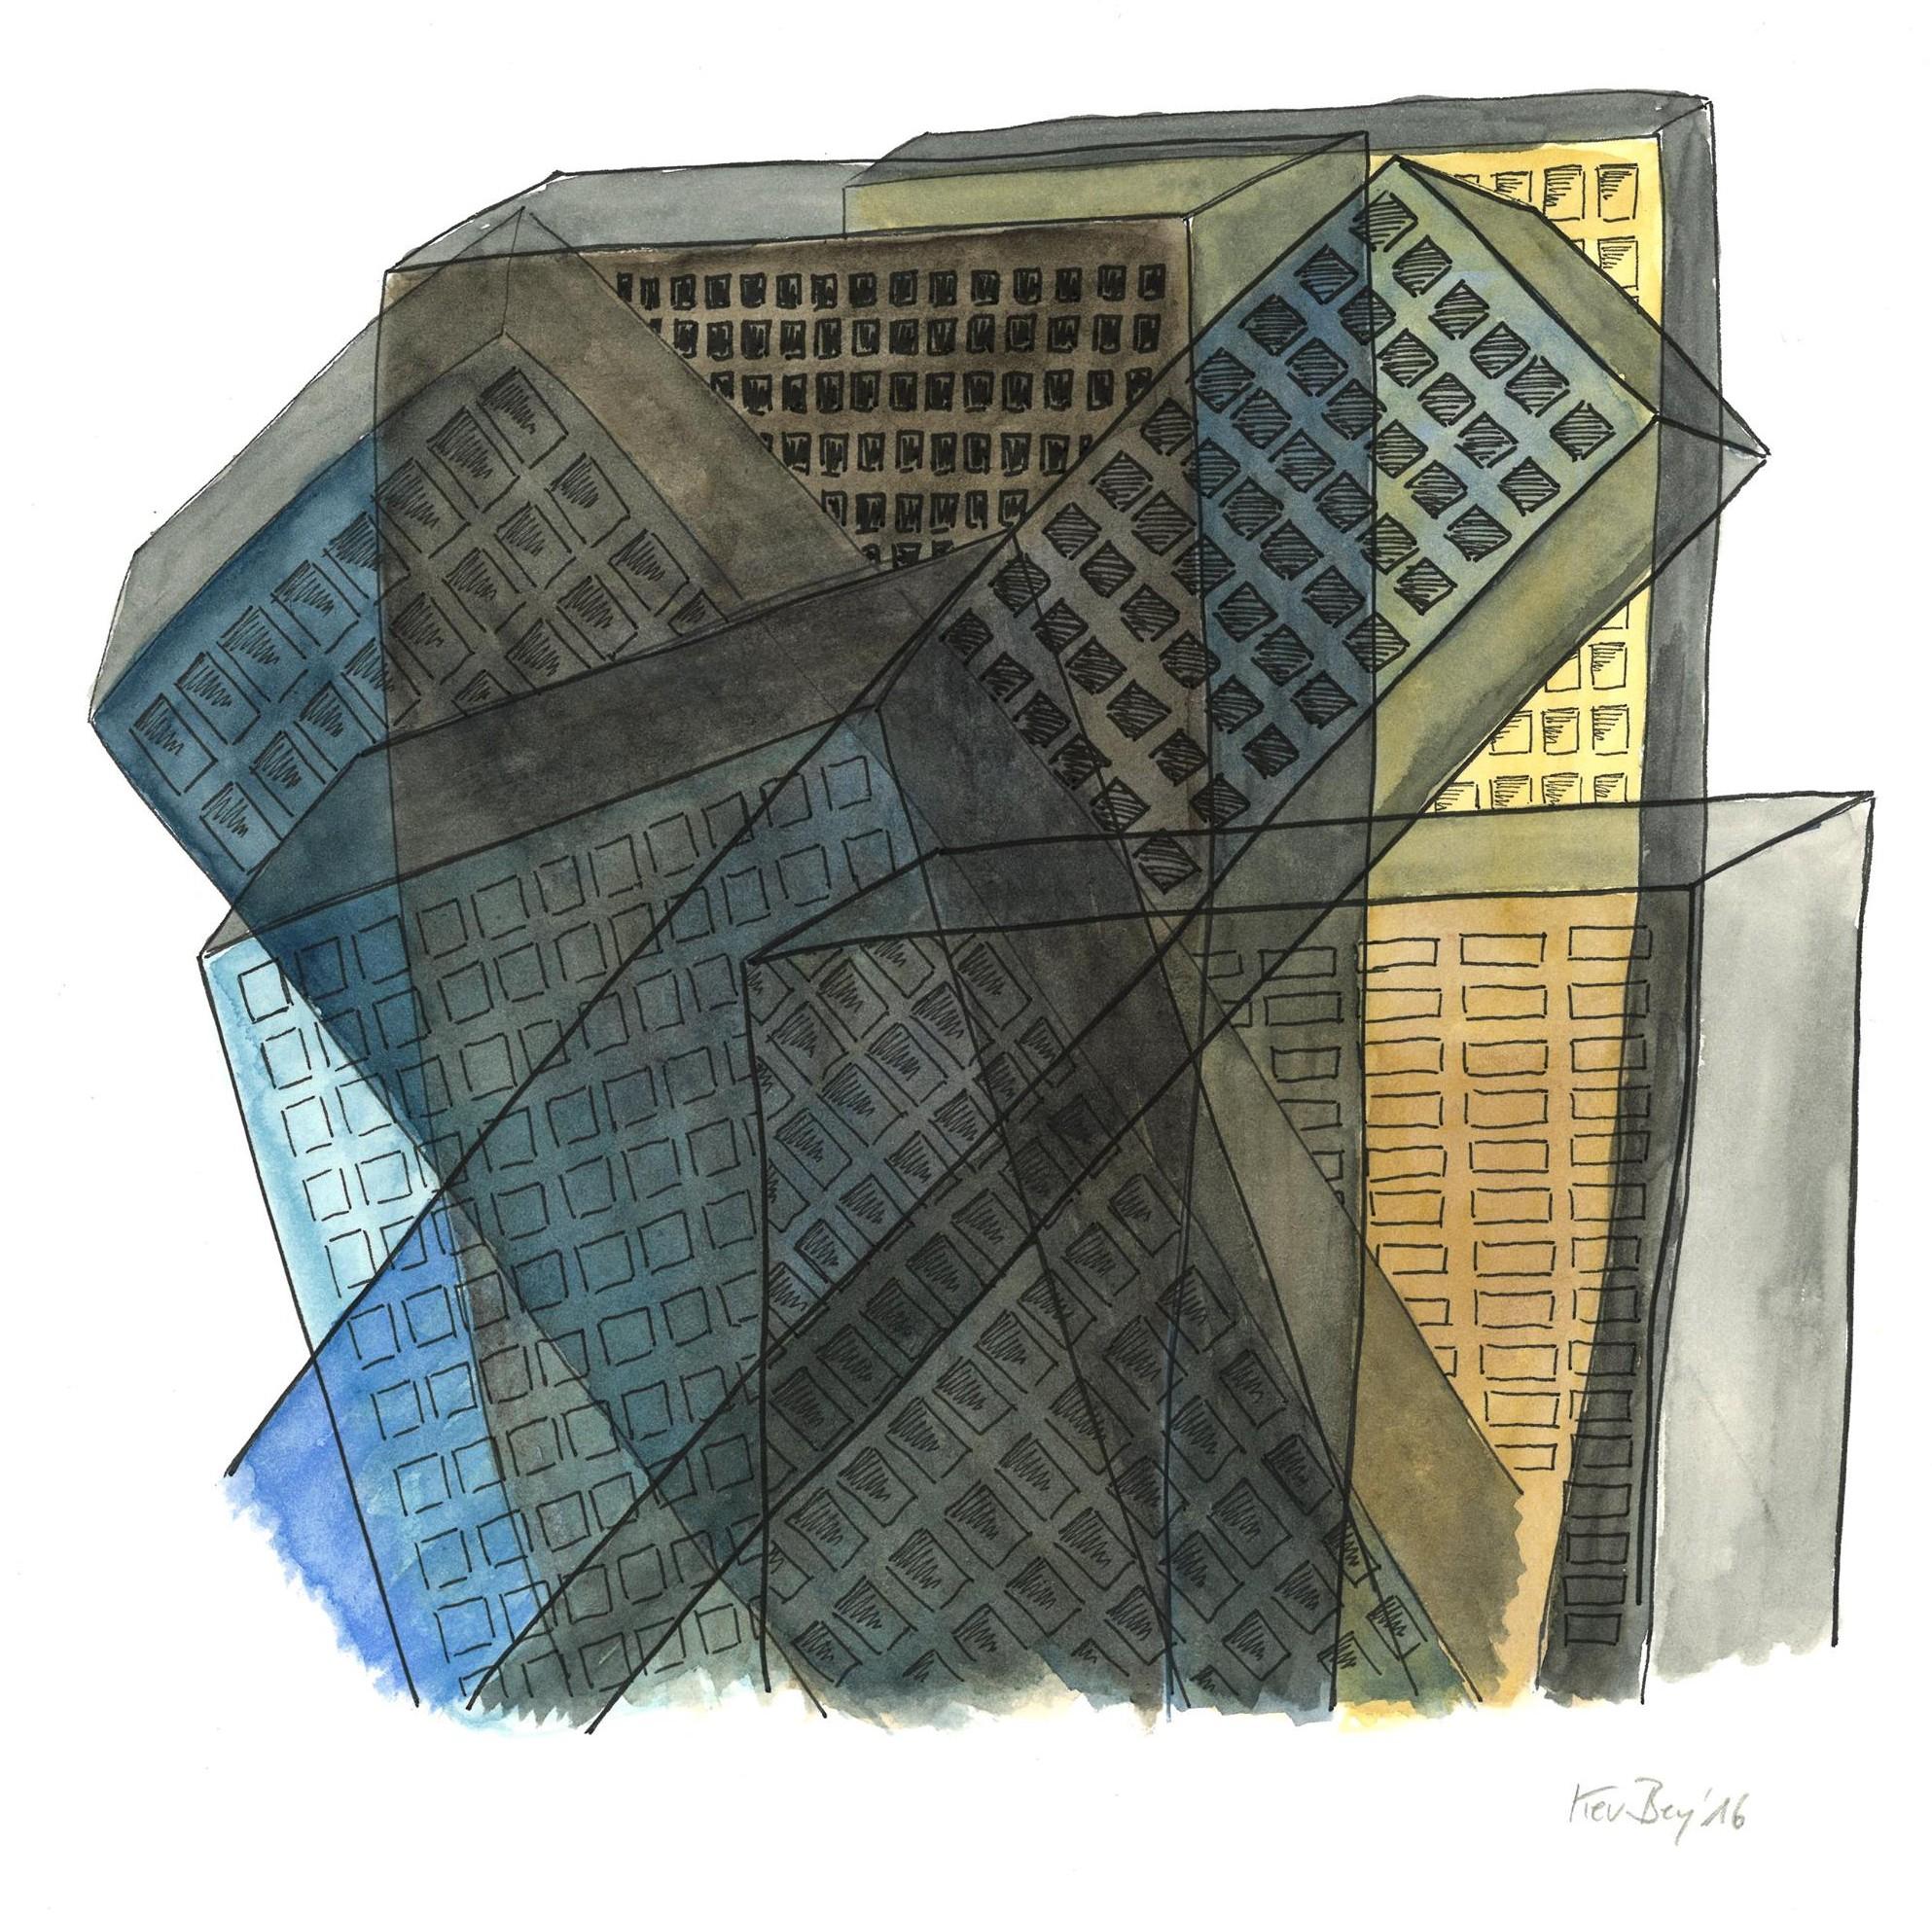 Kerstin Carolin Beyer, Transparenz, transparency, Chaotic City, painting, drawing, watercolor, ink, Chaos, City, painting, drawing watercolor